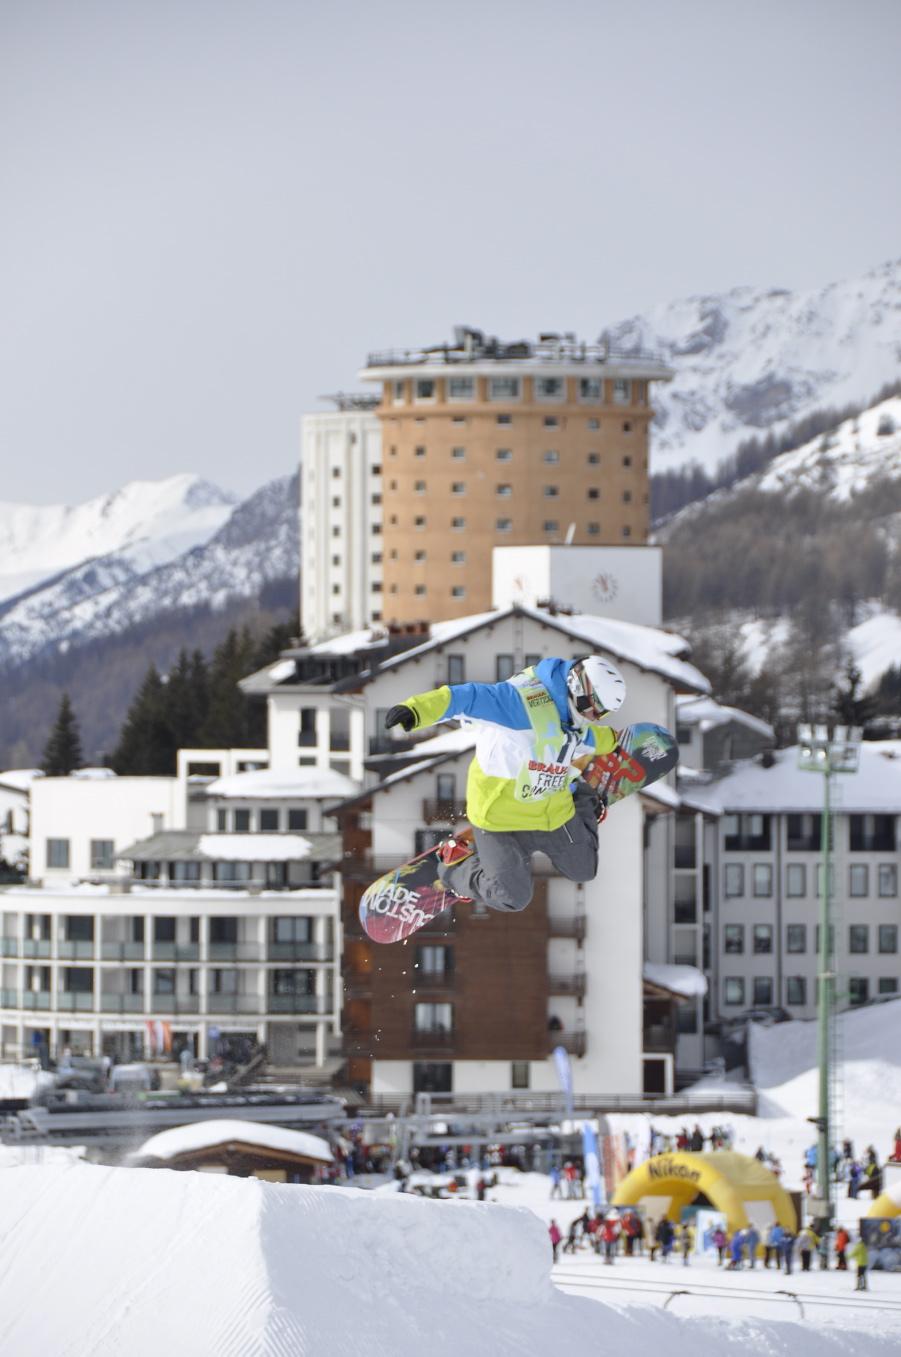 Braulio Vertical Tour, Slopestyle, Snowboard